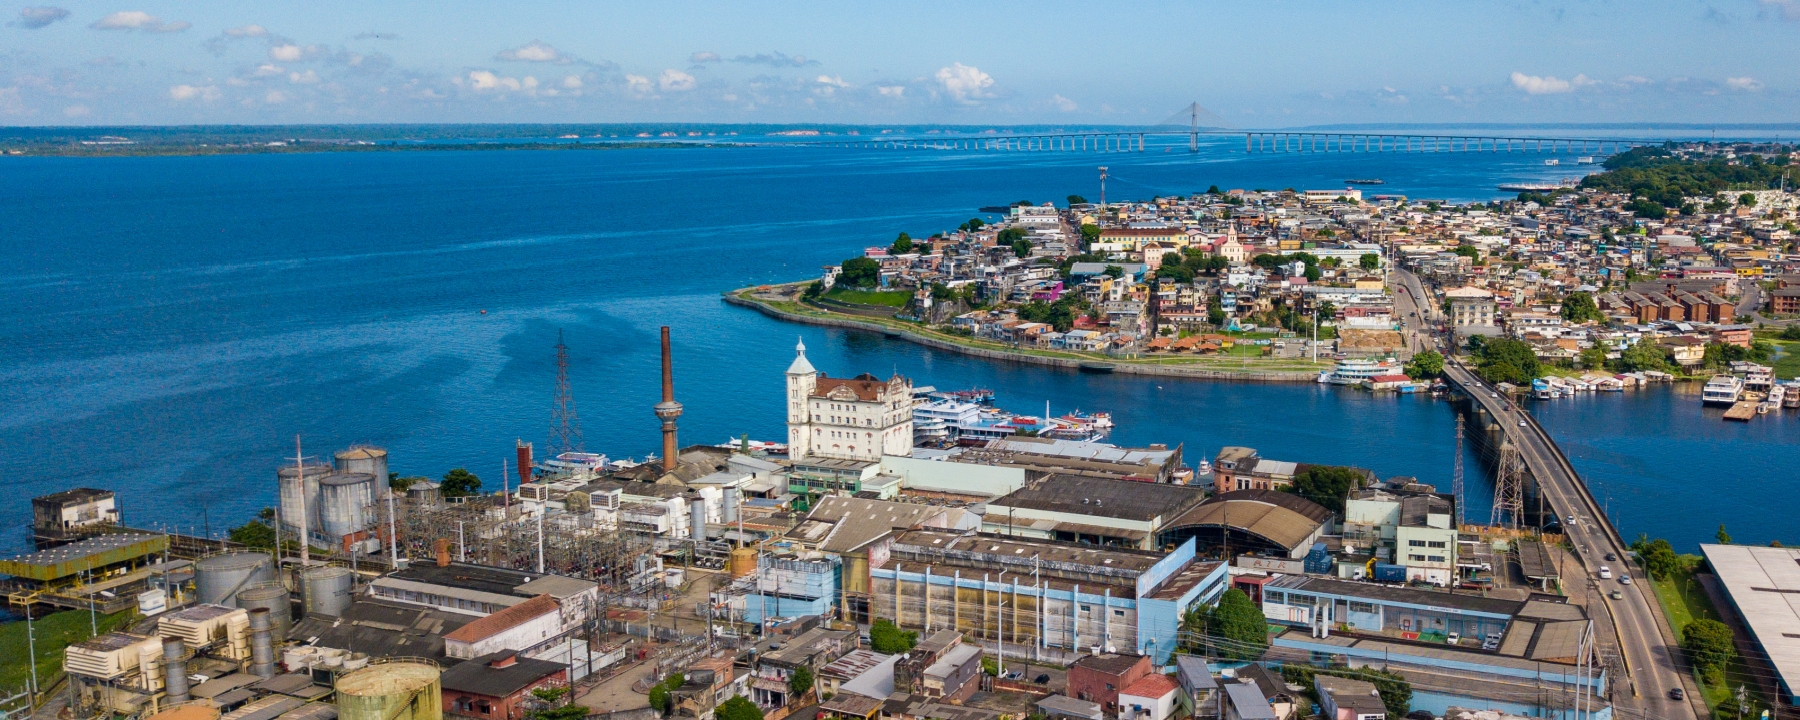 Study Estimates 76 Percent of Brazilian City Exposed to SARS-CoV-2